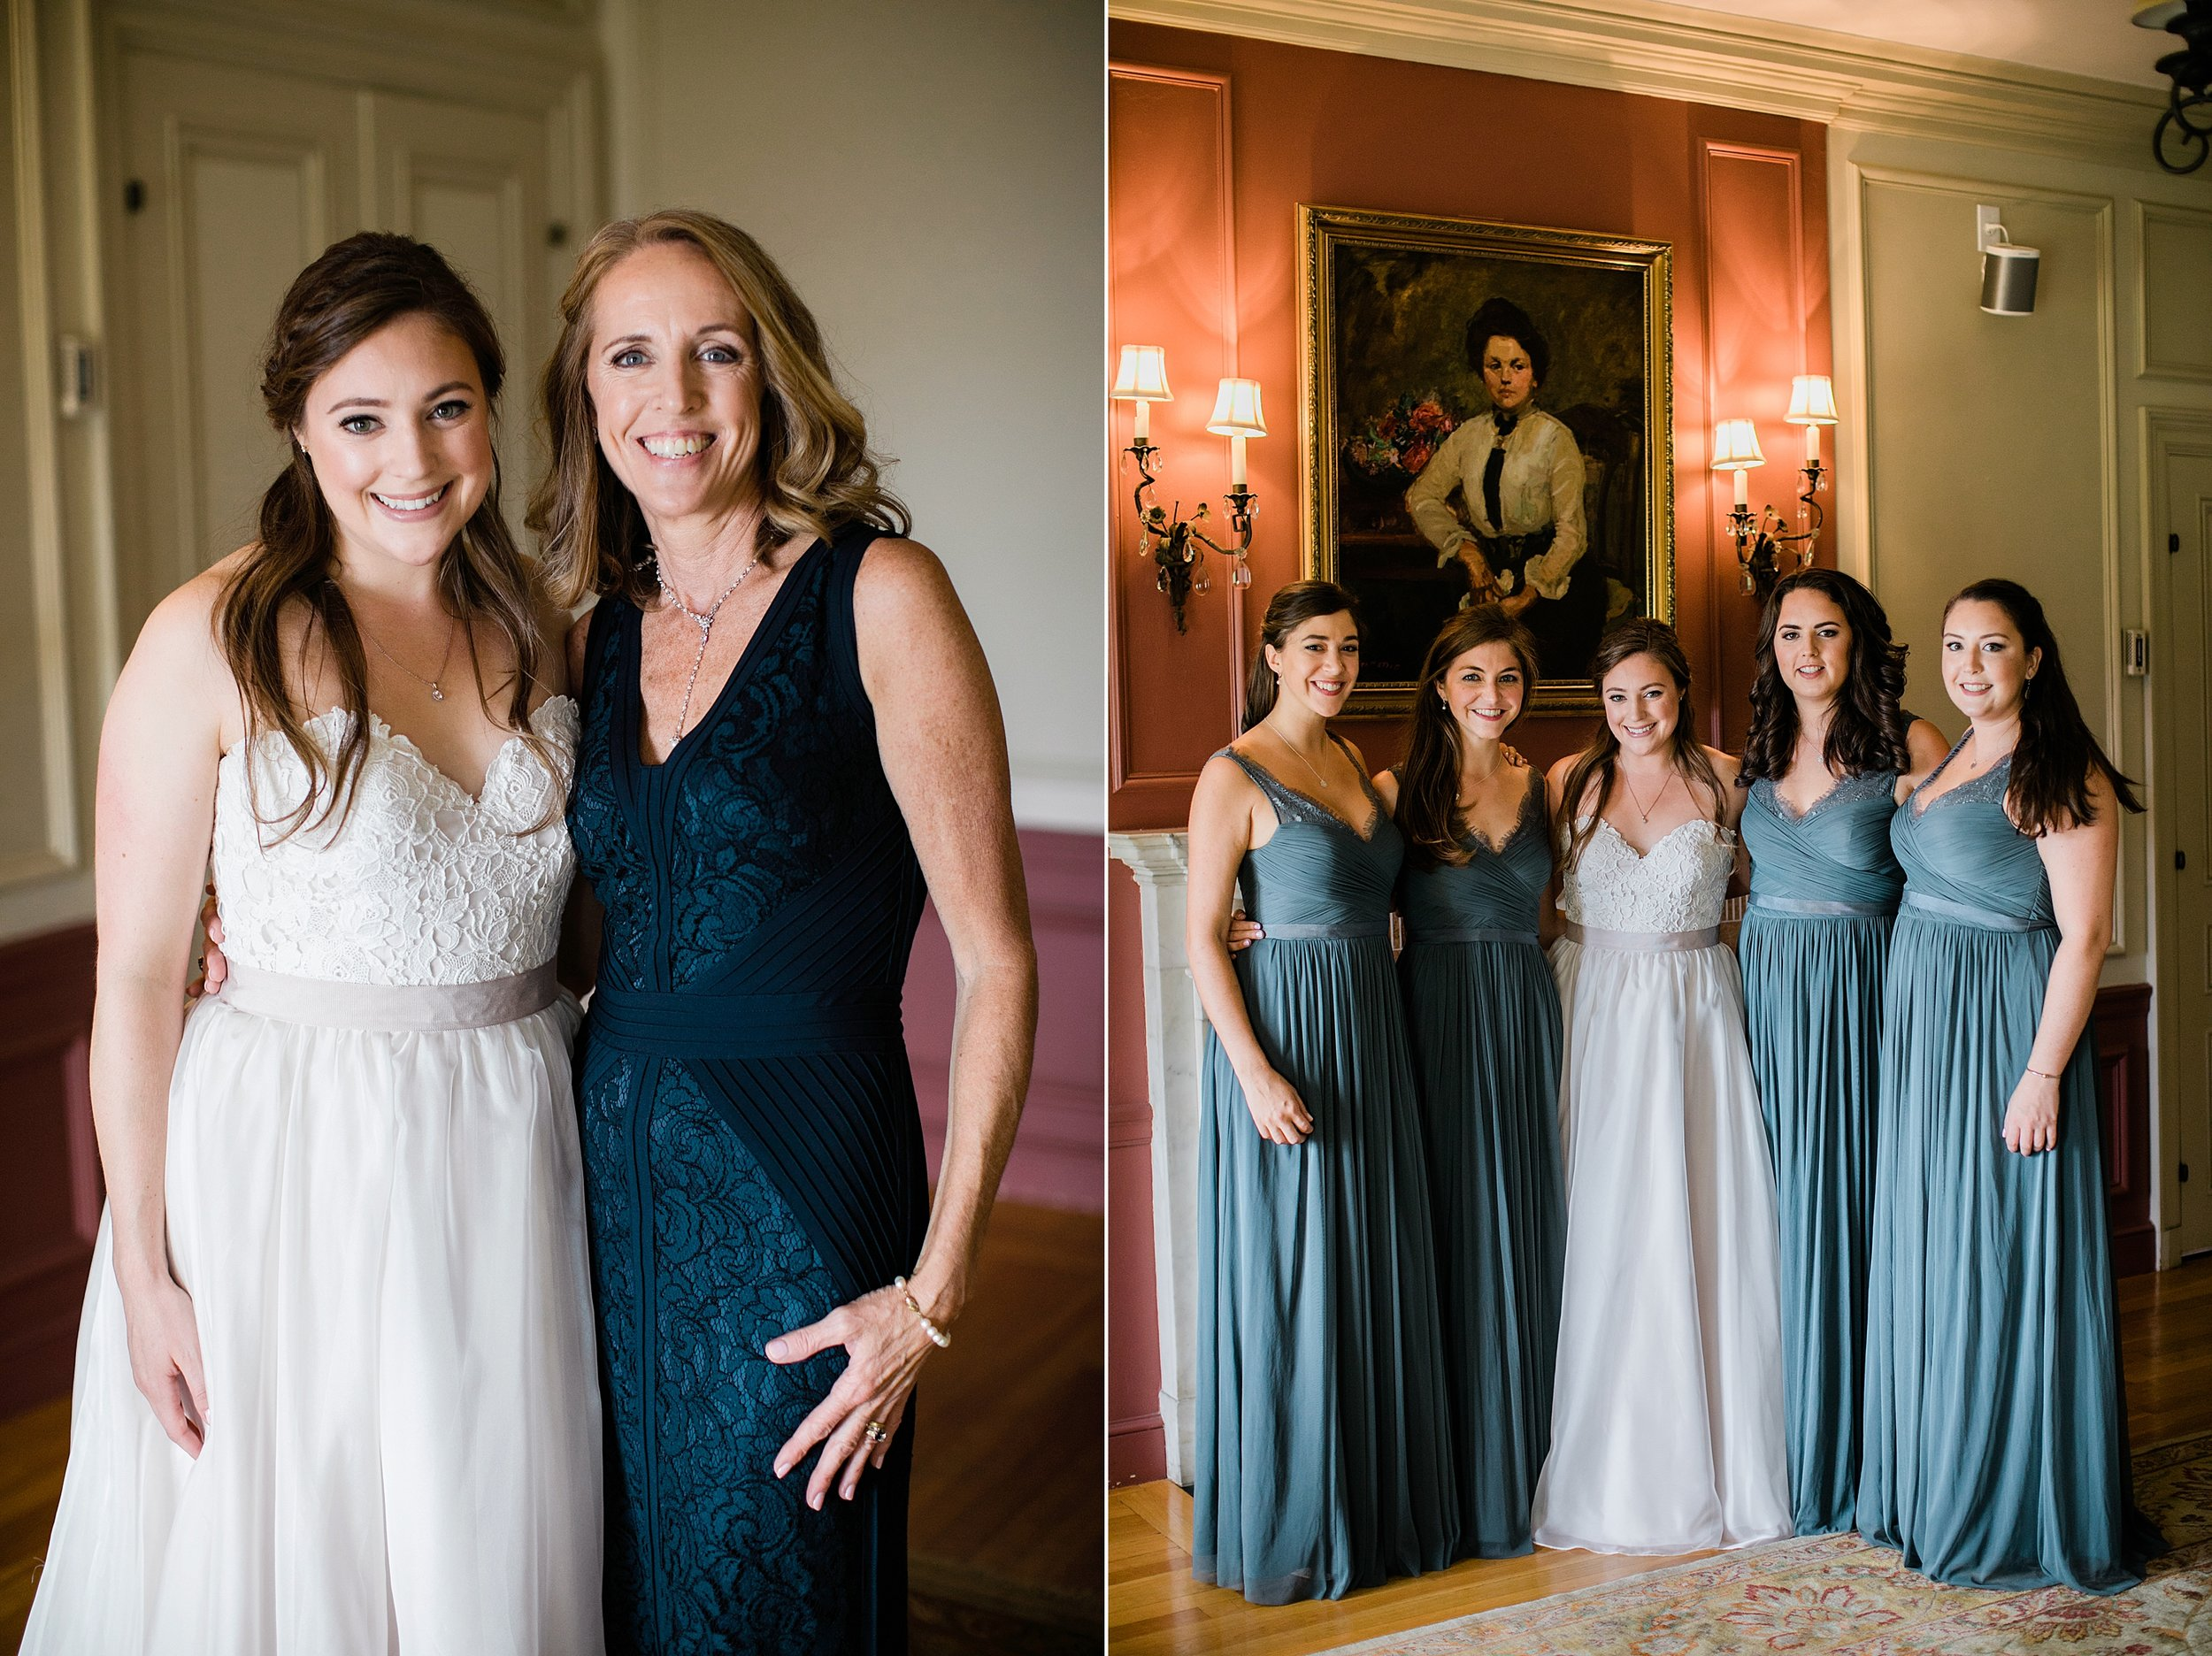 010 los angeles wedding photographer todd danforth photography boston.jpg